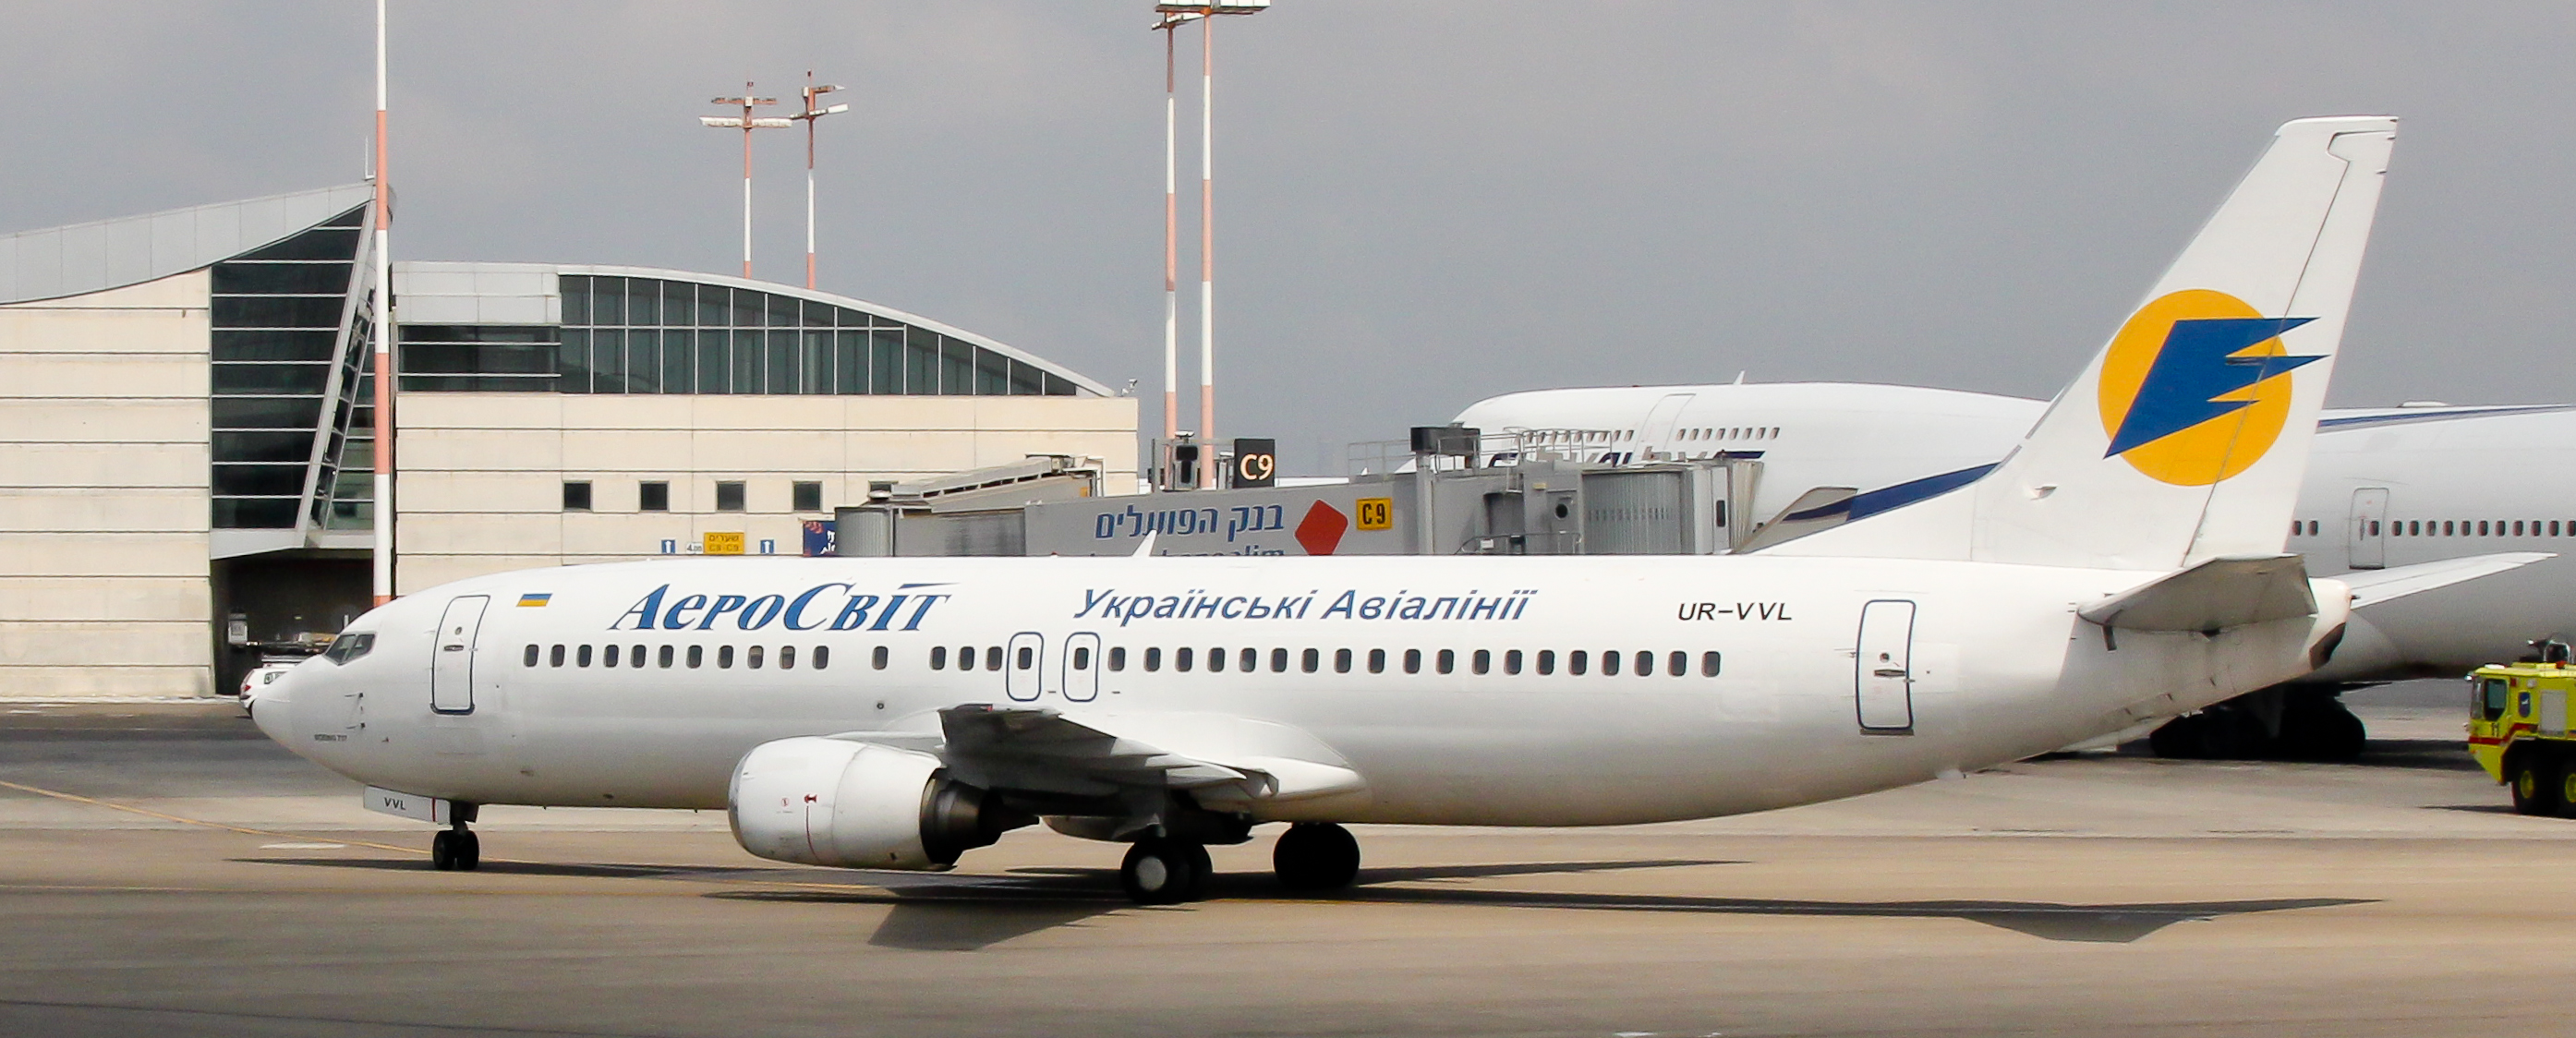 File:AeroSvit - Boeing 737-448...